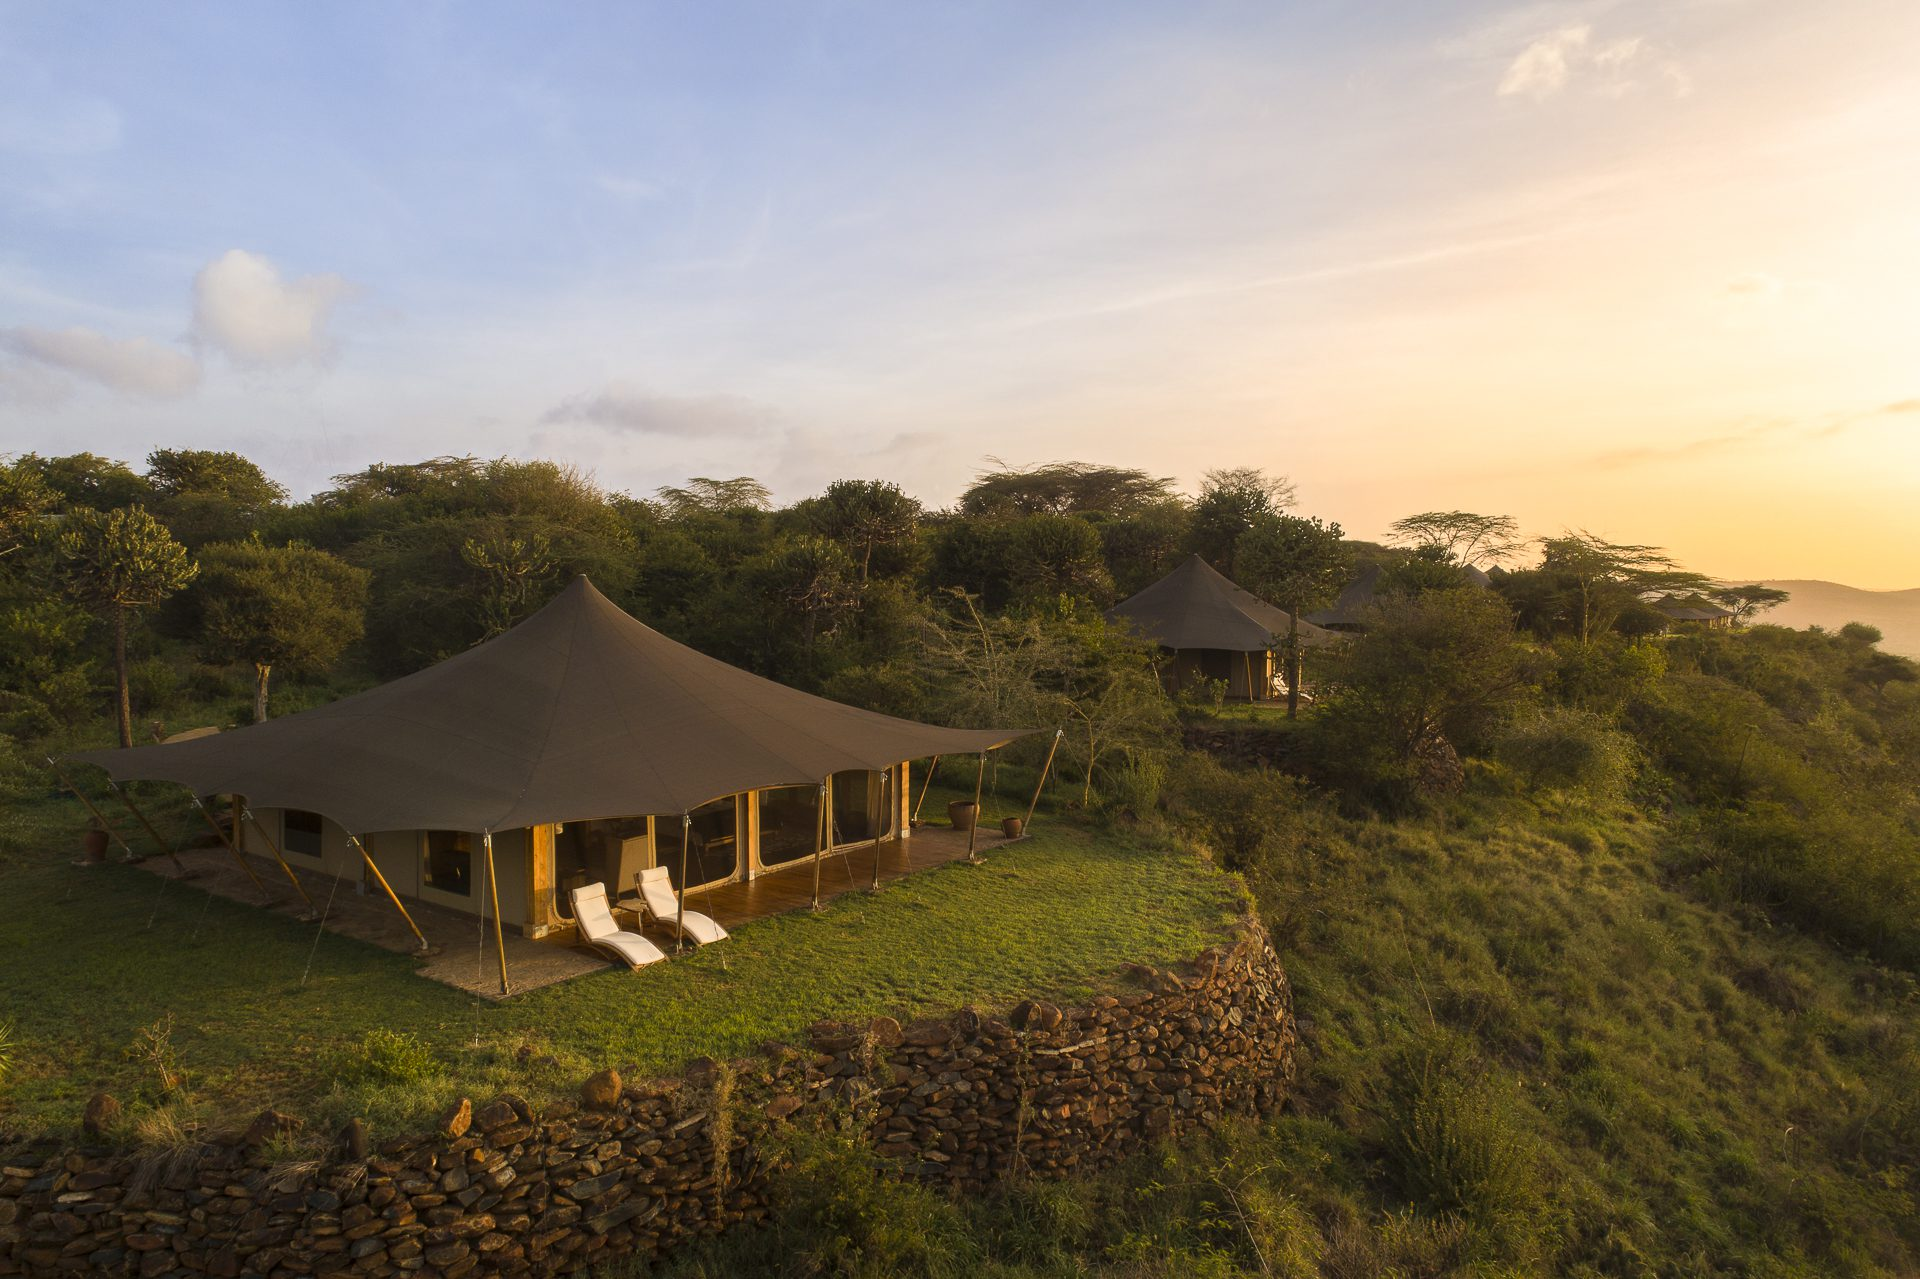 tented safari camp on the edge of a hill at sunrise